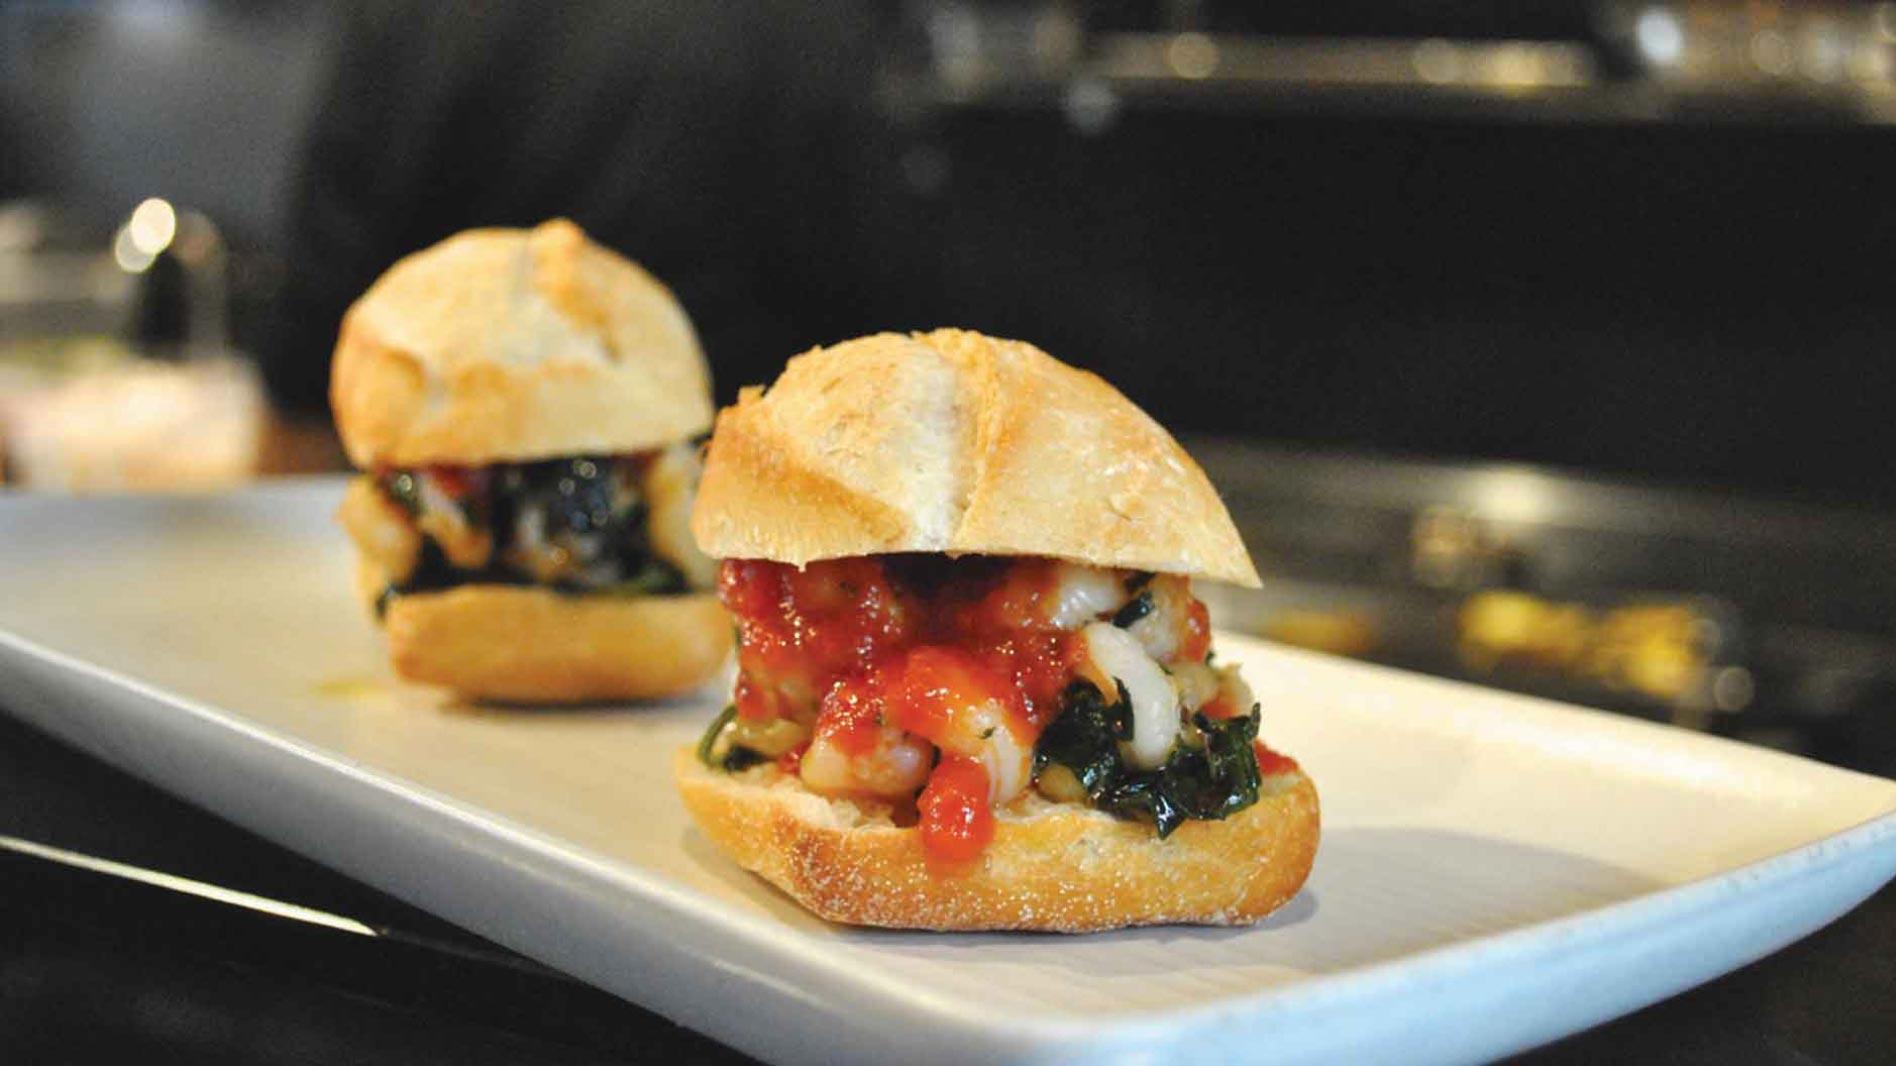 Chilli and Garlic Prawn Slider